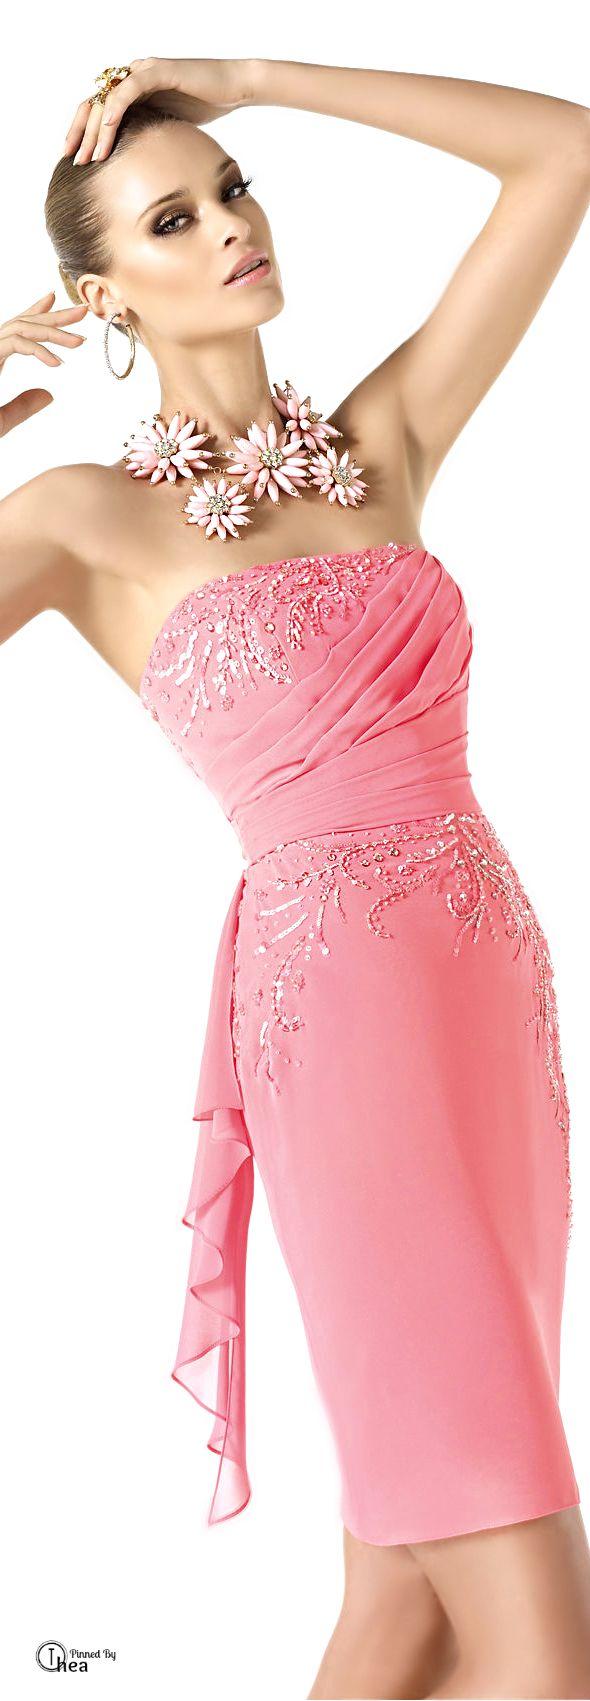 109 best Vestidos images on Pinterest | Alteration shop, Clothing ...